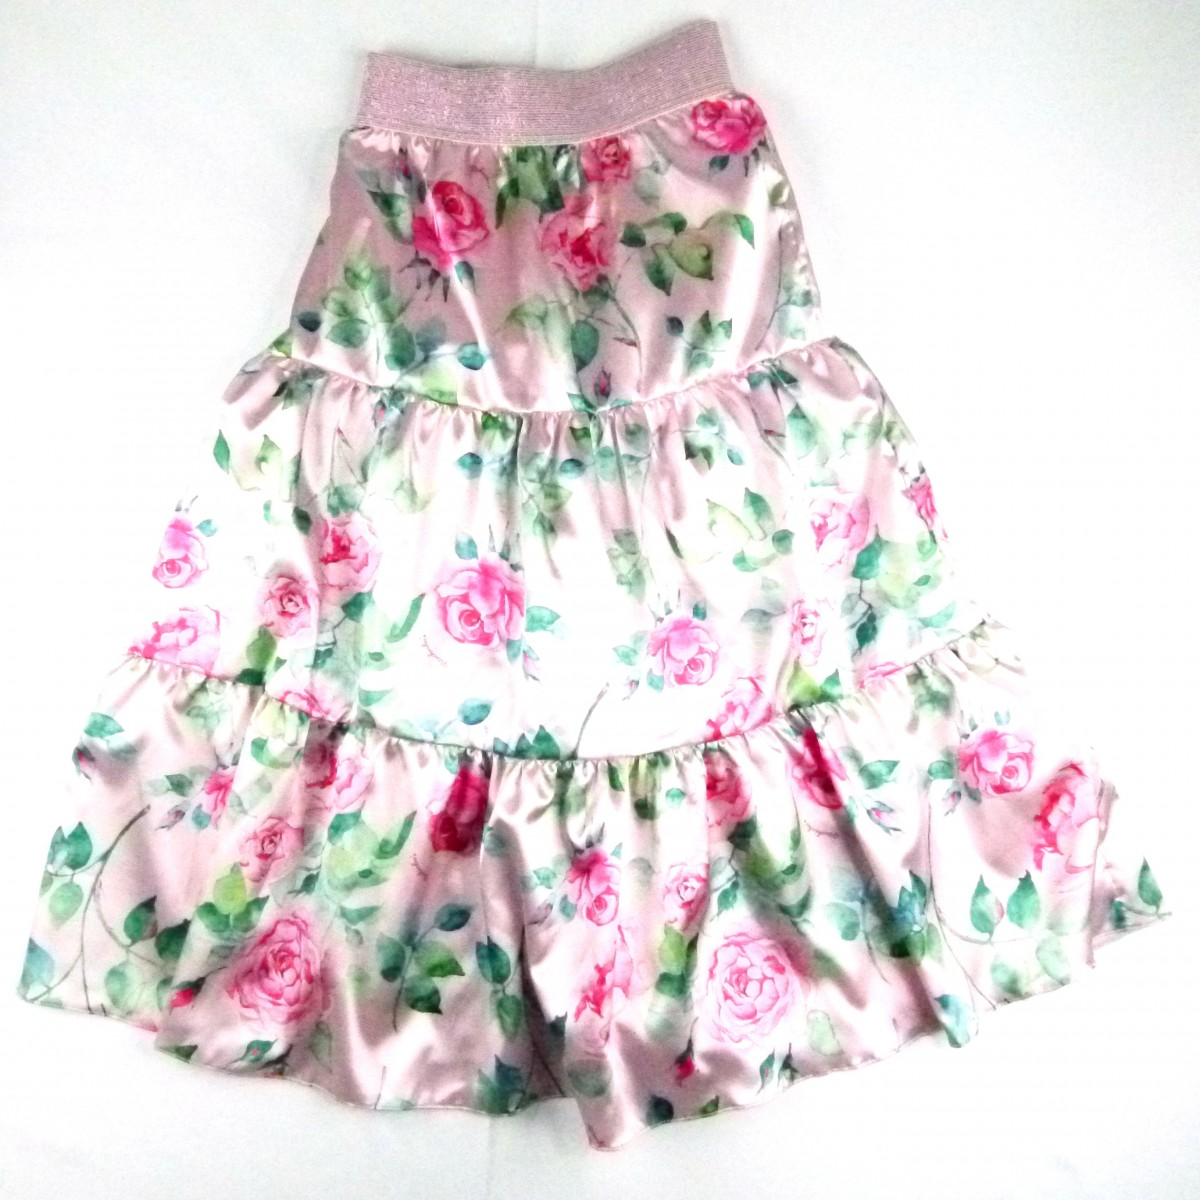 Saia Longa Cetim Floral Pituchinhu ´ s - 033228 Rosa